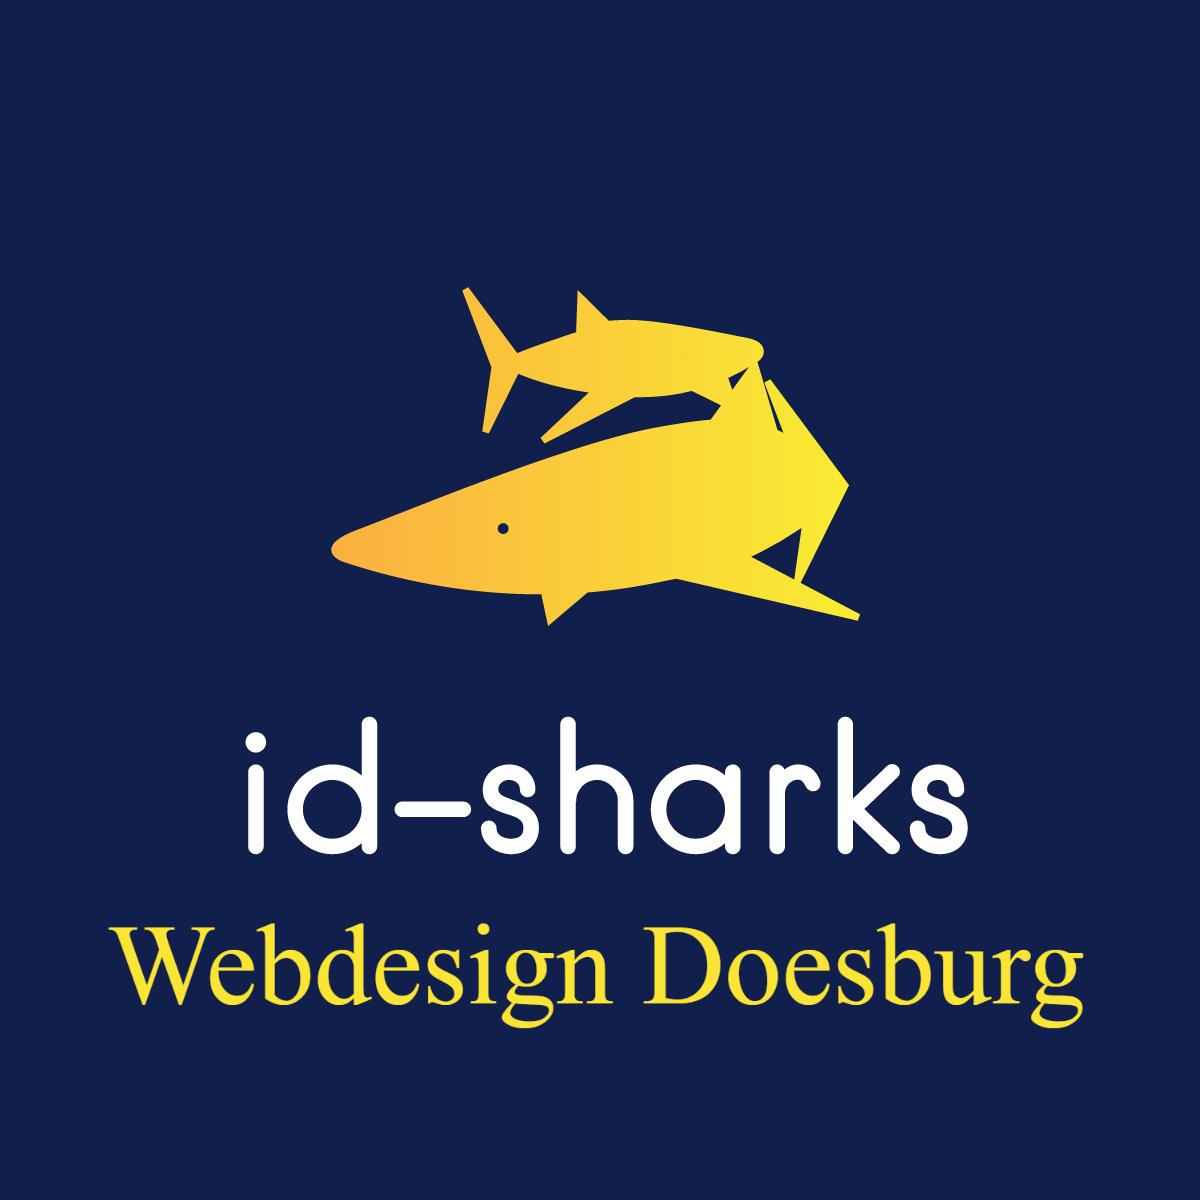 Webdesign Doesburg